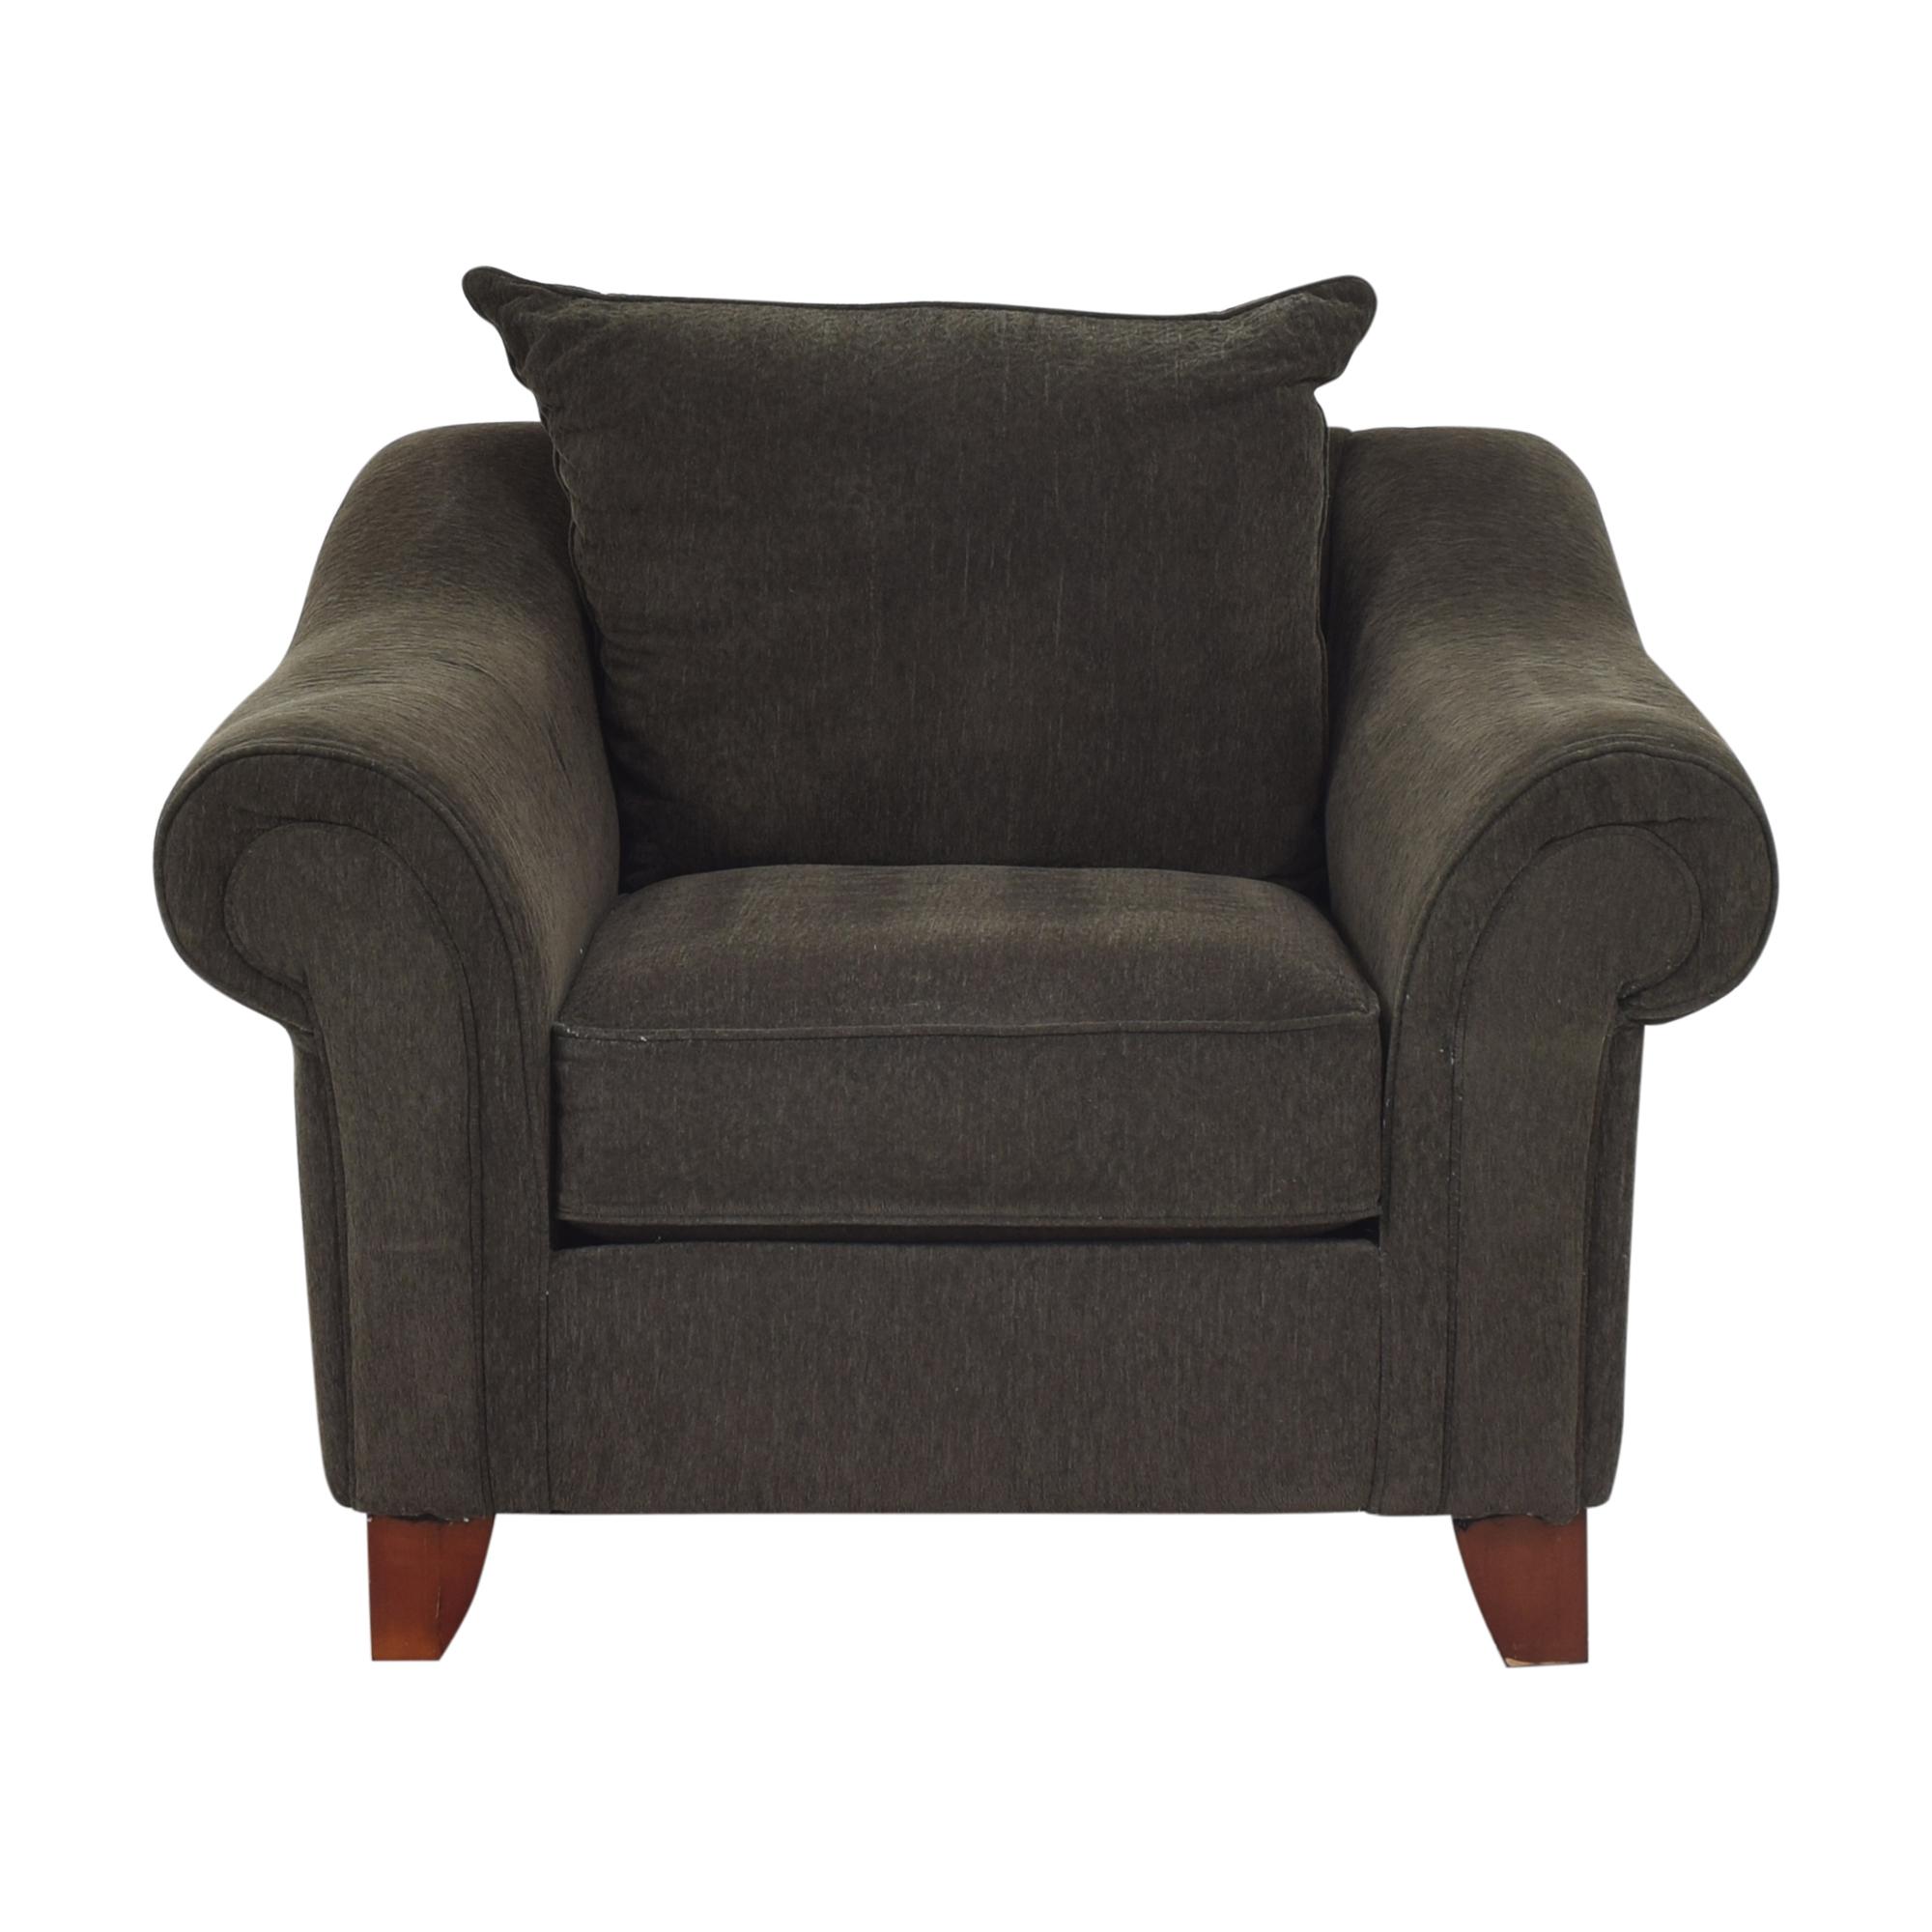 Raymour & Flanigan Raymour & Flanigan Molly Chair ct